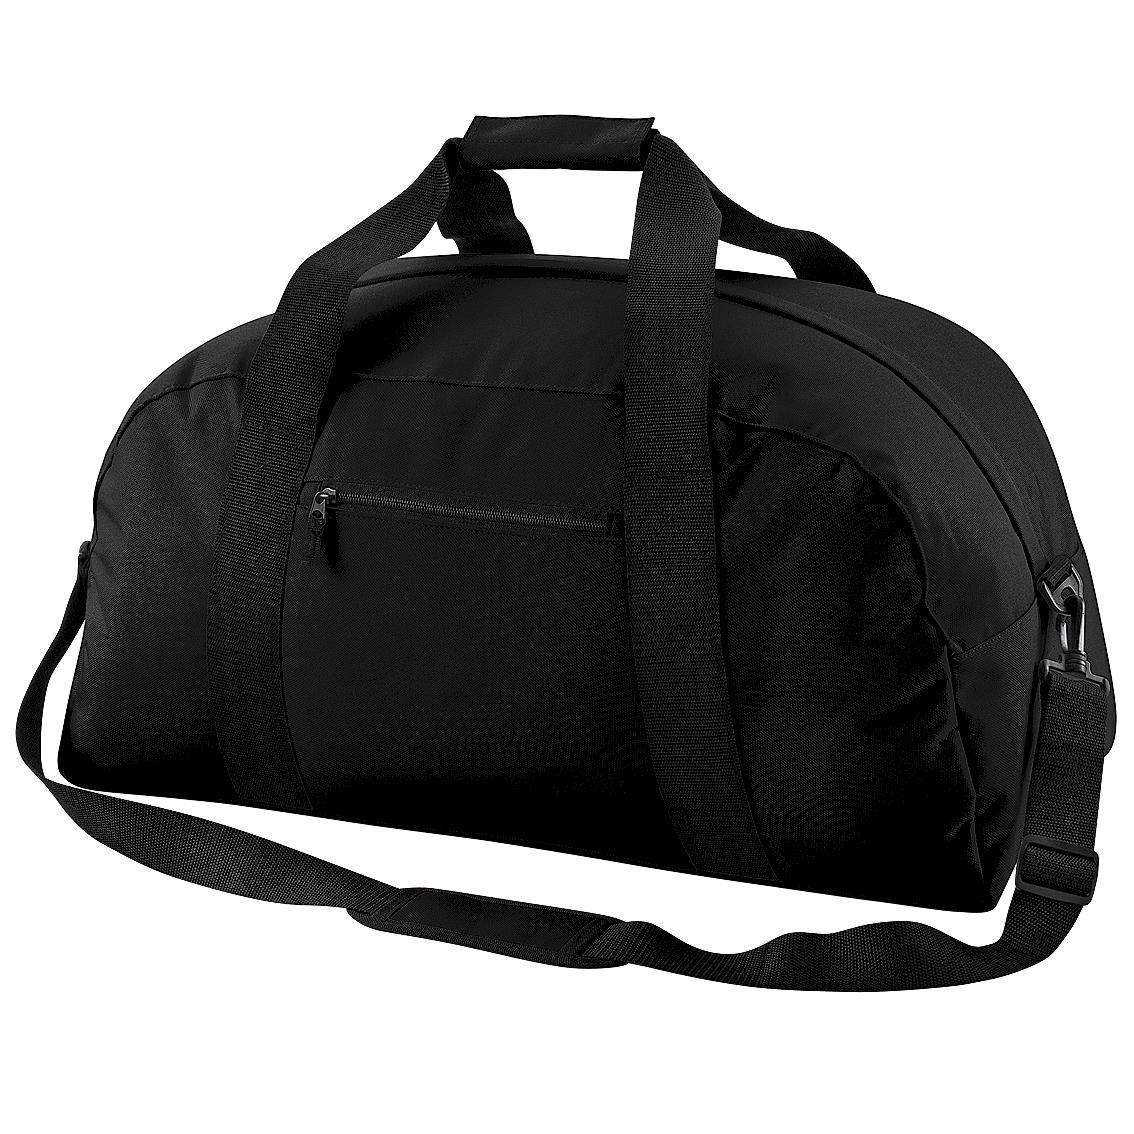 Elegant Men Women Luggage Travel Bag Satchel Shoulder Gym Sports Bag Duffel Handbag 20u0026quot; | EBay